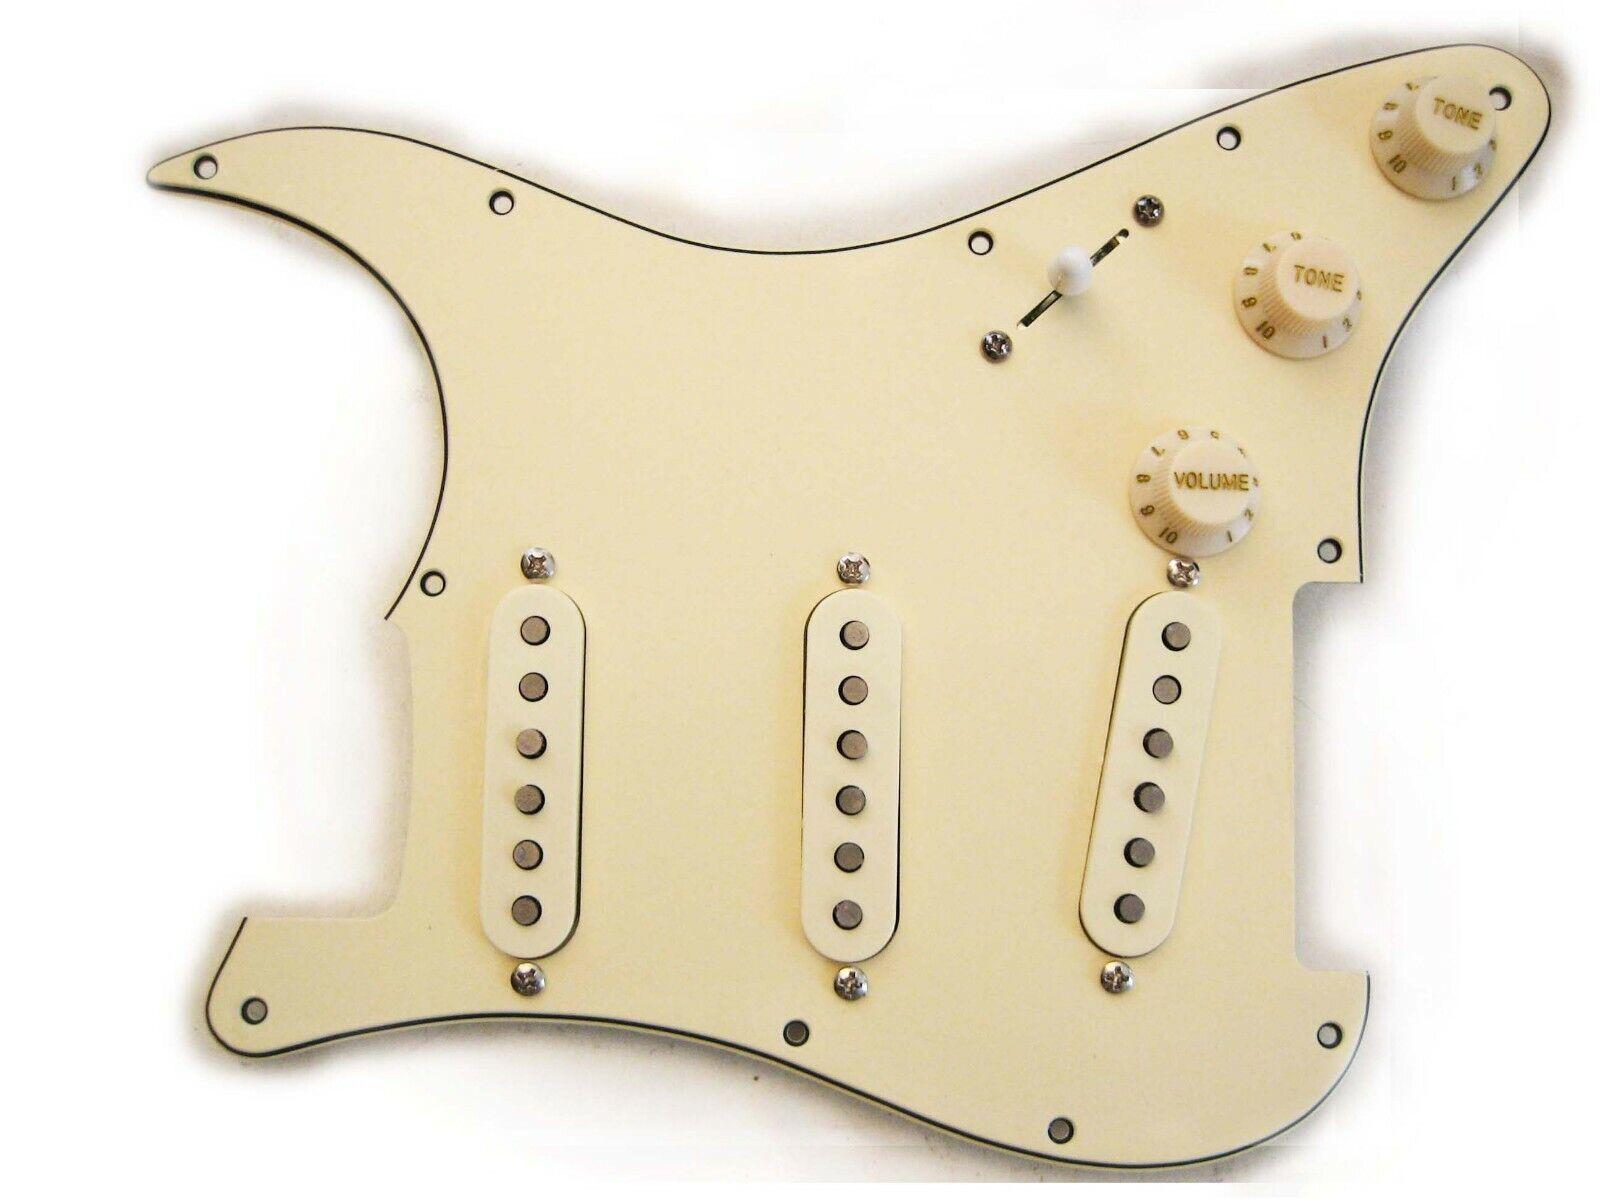 Fender Vintage Noiseless Clapton Loaded Strat Pickguard TBX Mid Boost Aged Cream